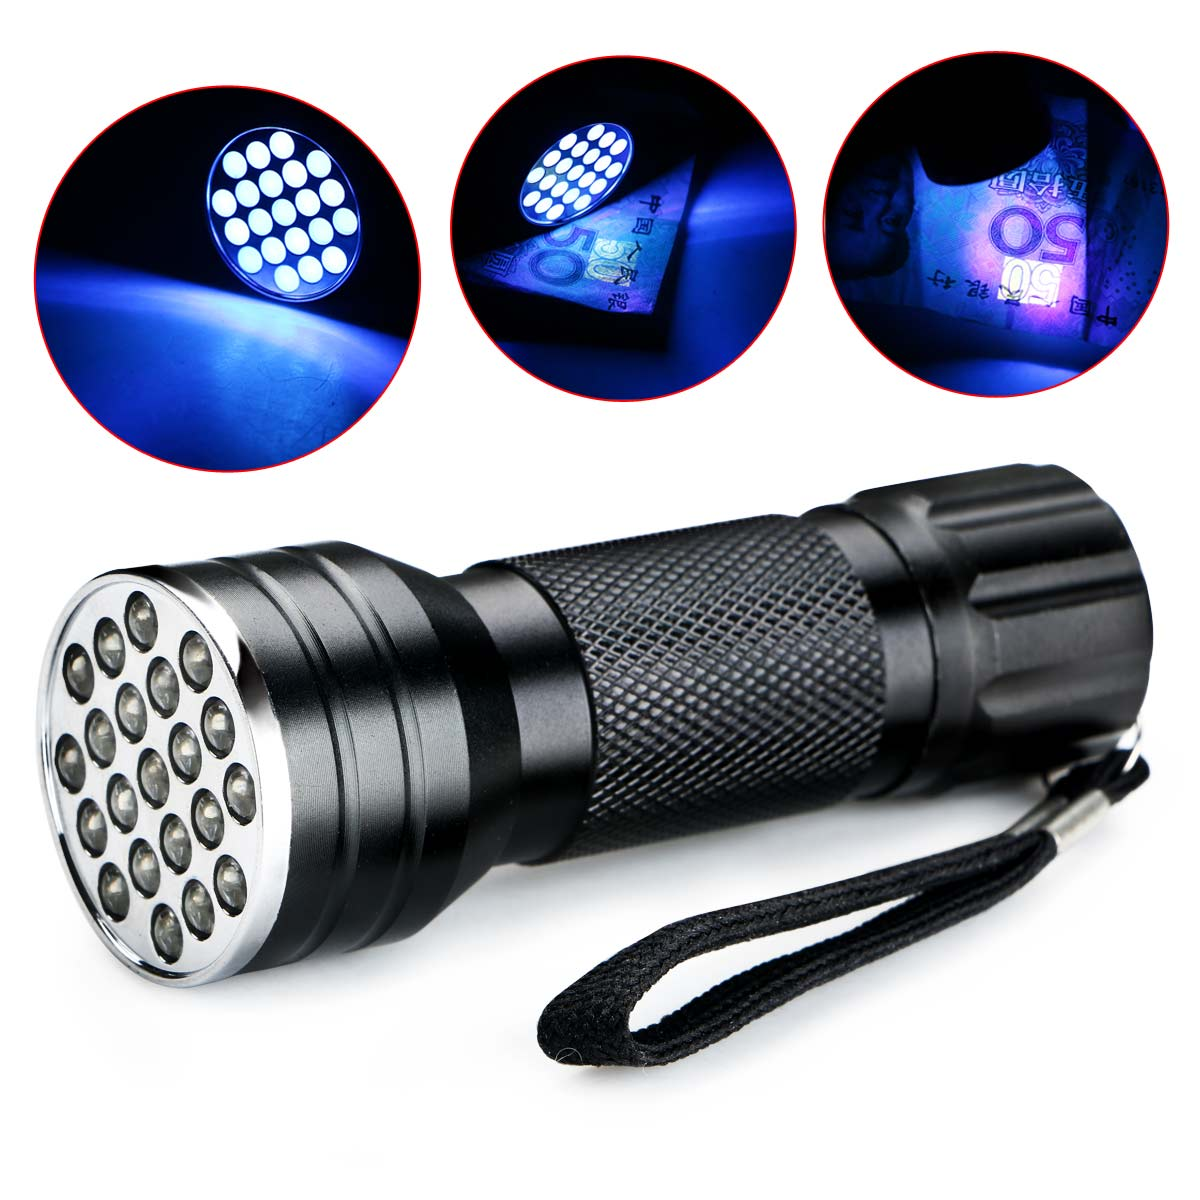 NEW Aluminium Invisible Blacklight Ink Marker 21LED 21 LED UV Ultra Violet 395nm Flashlight Torch Light Lamp For 3AAA(China (Mainland))